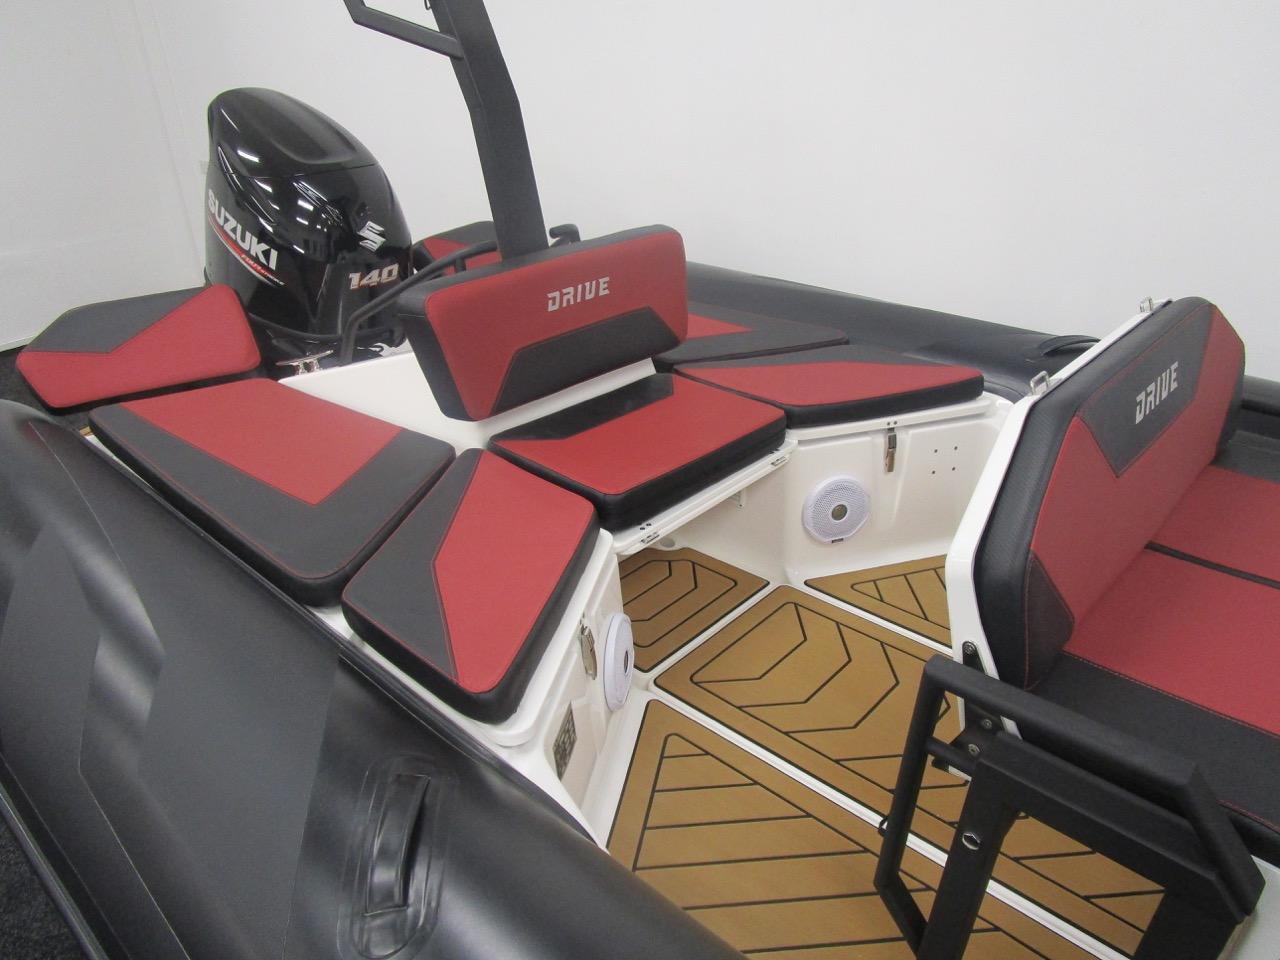 GRAND DRIVE D600 RIB rear sundecks